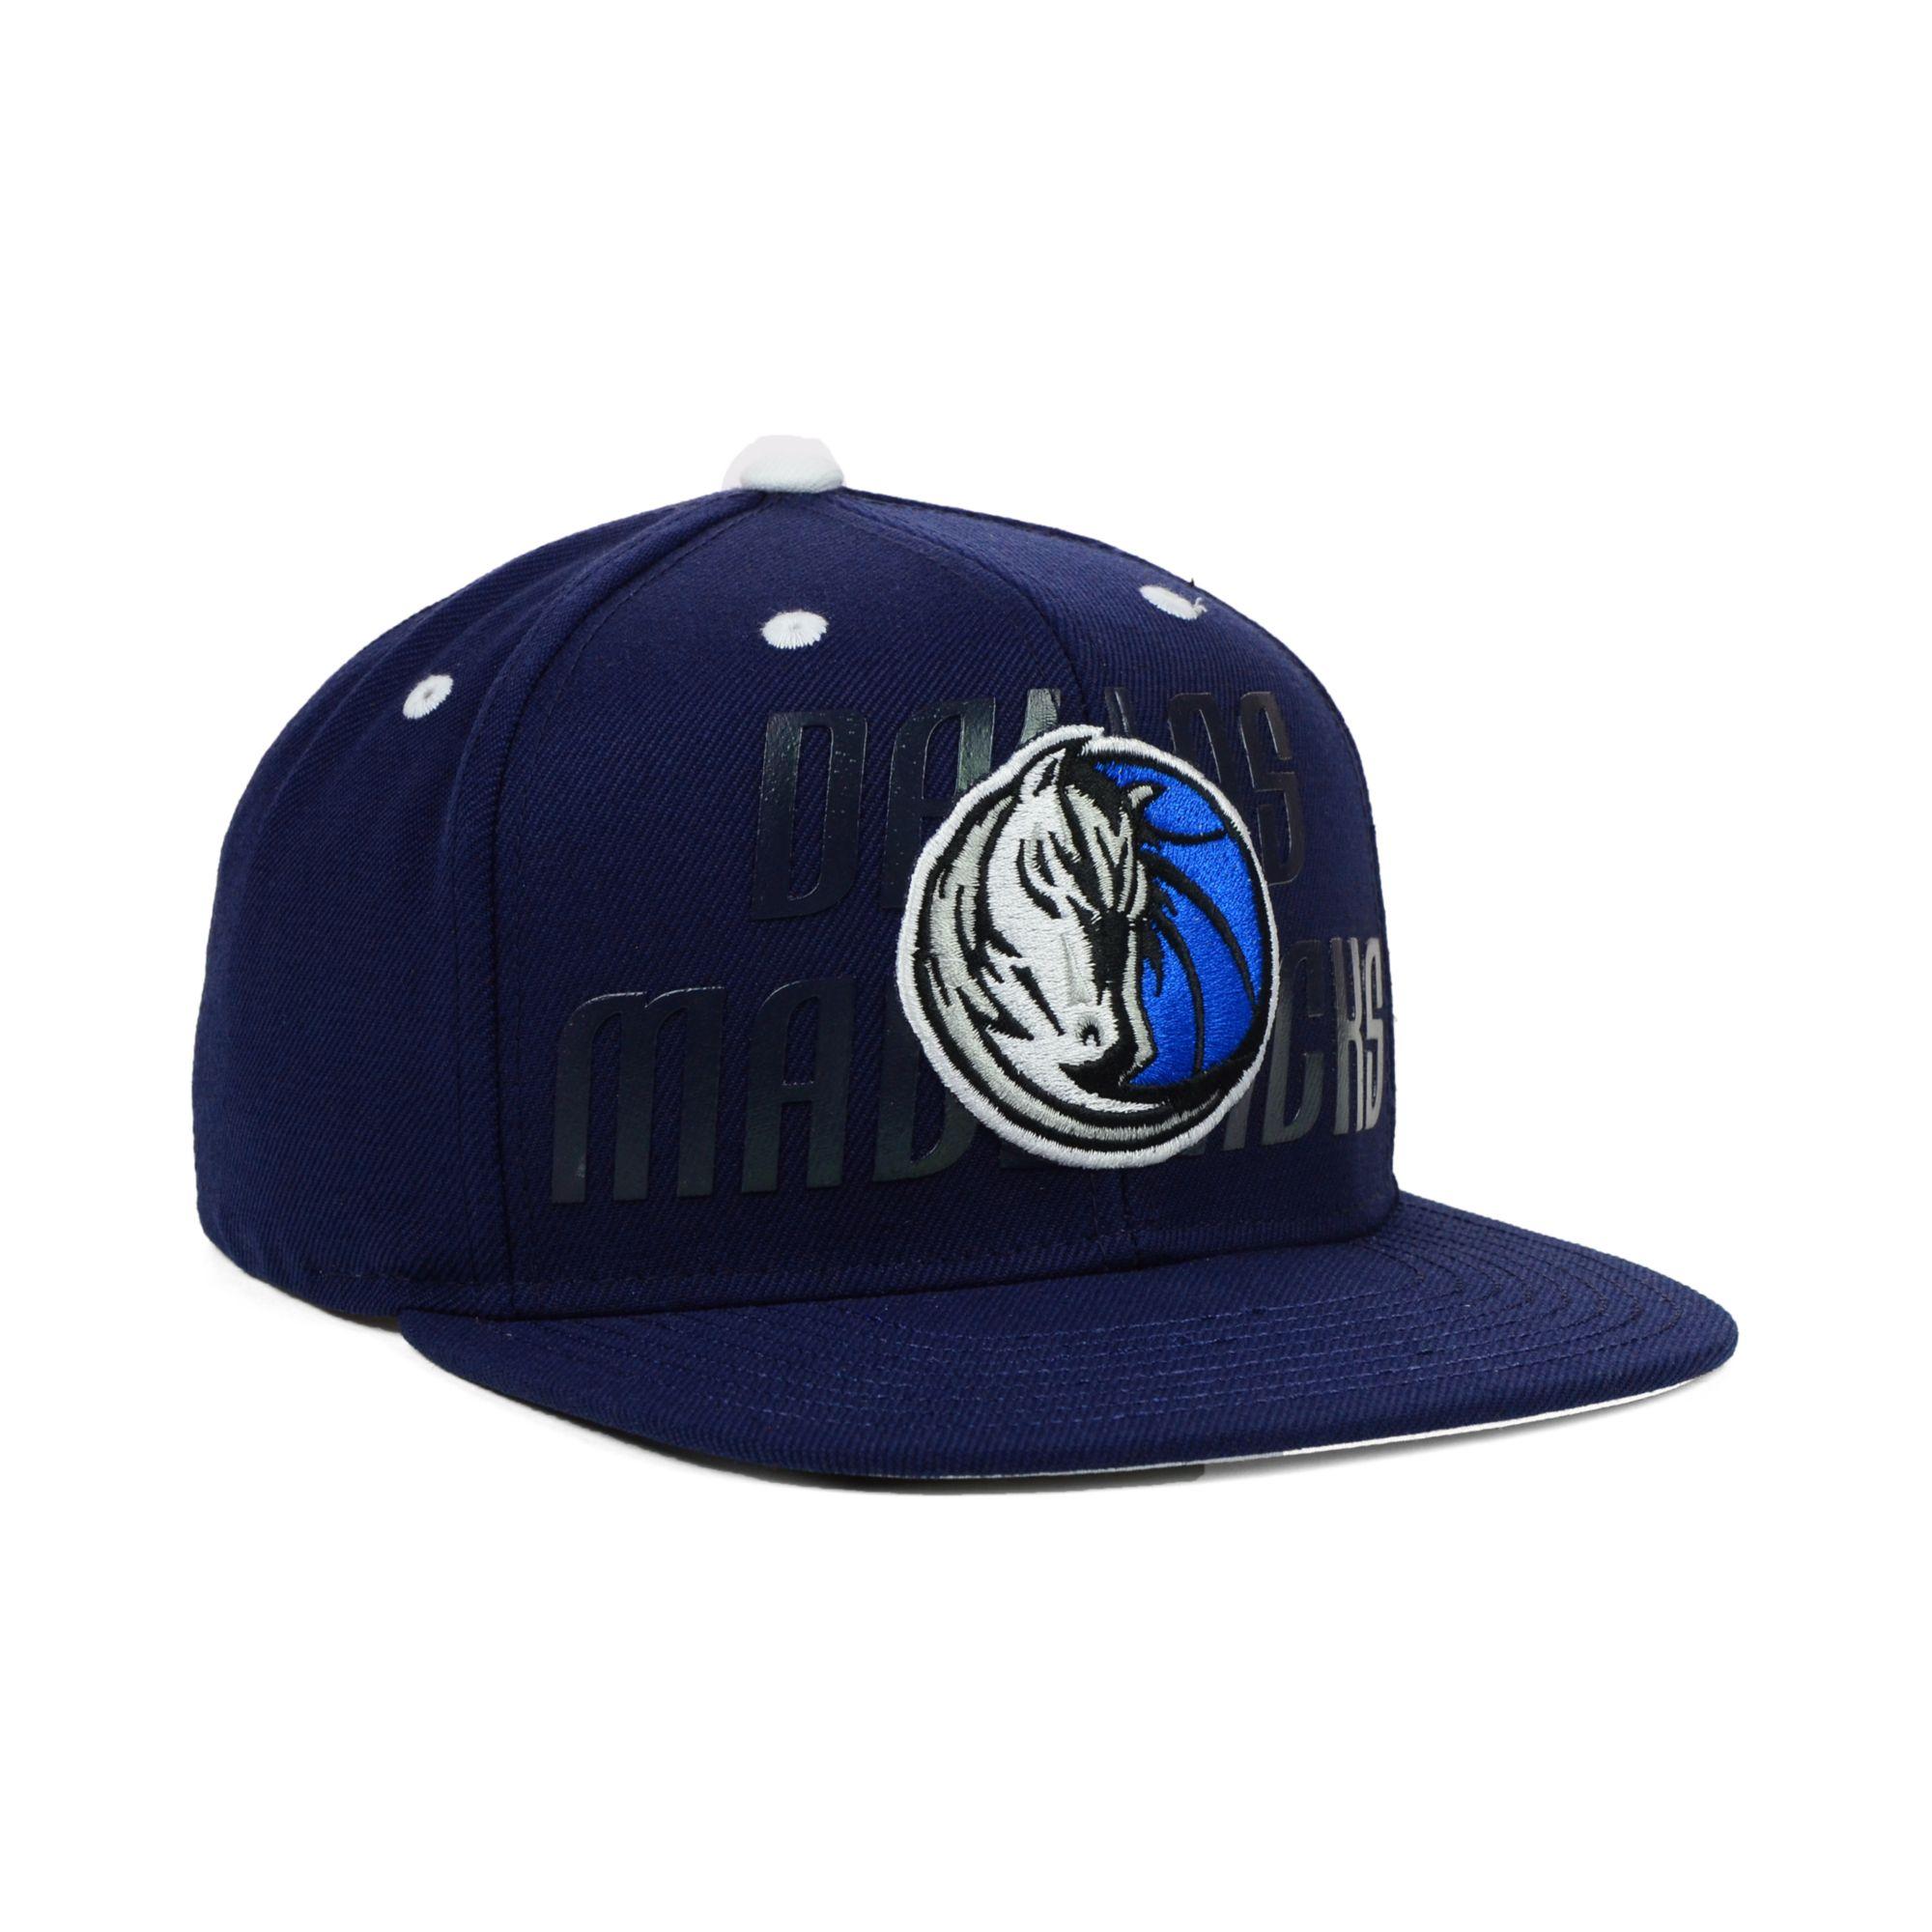 e5039ec25f8 Lyst - Adidas Dallas Mavericks Nba Draft Snapback Cap in Blue for Men